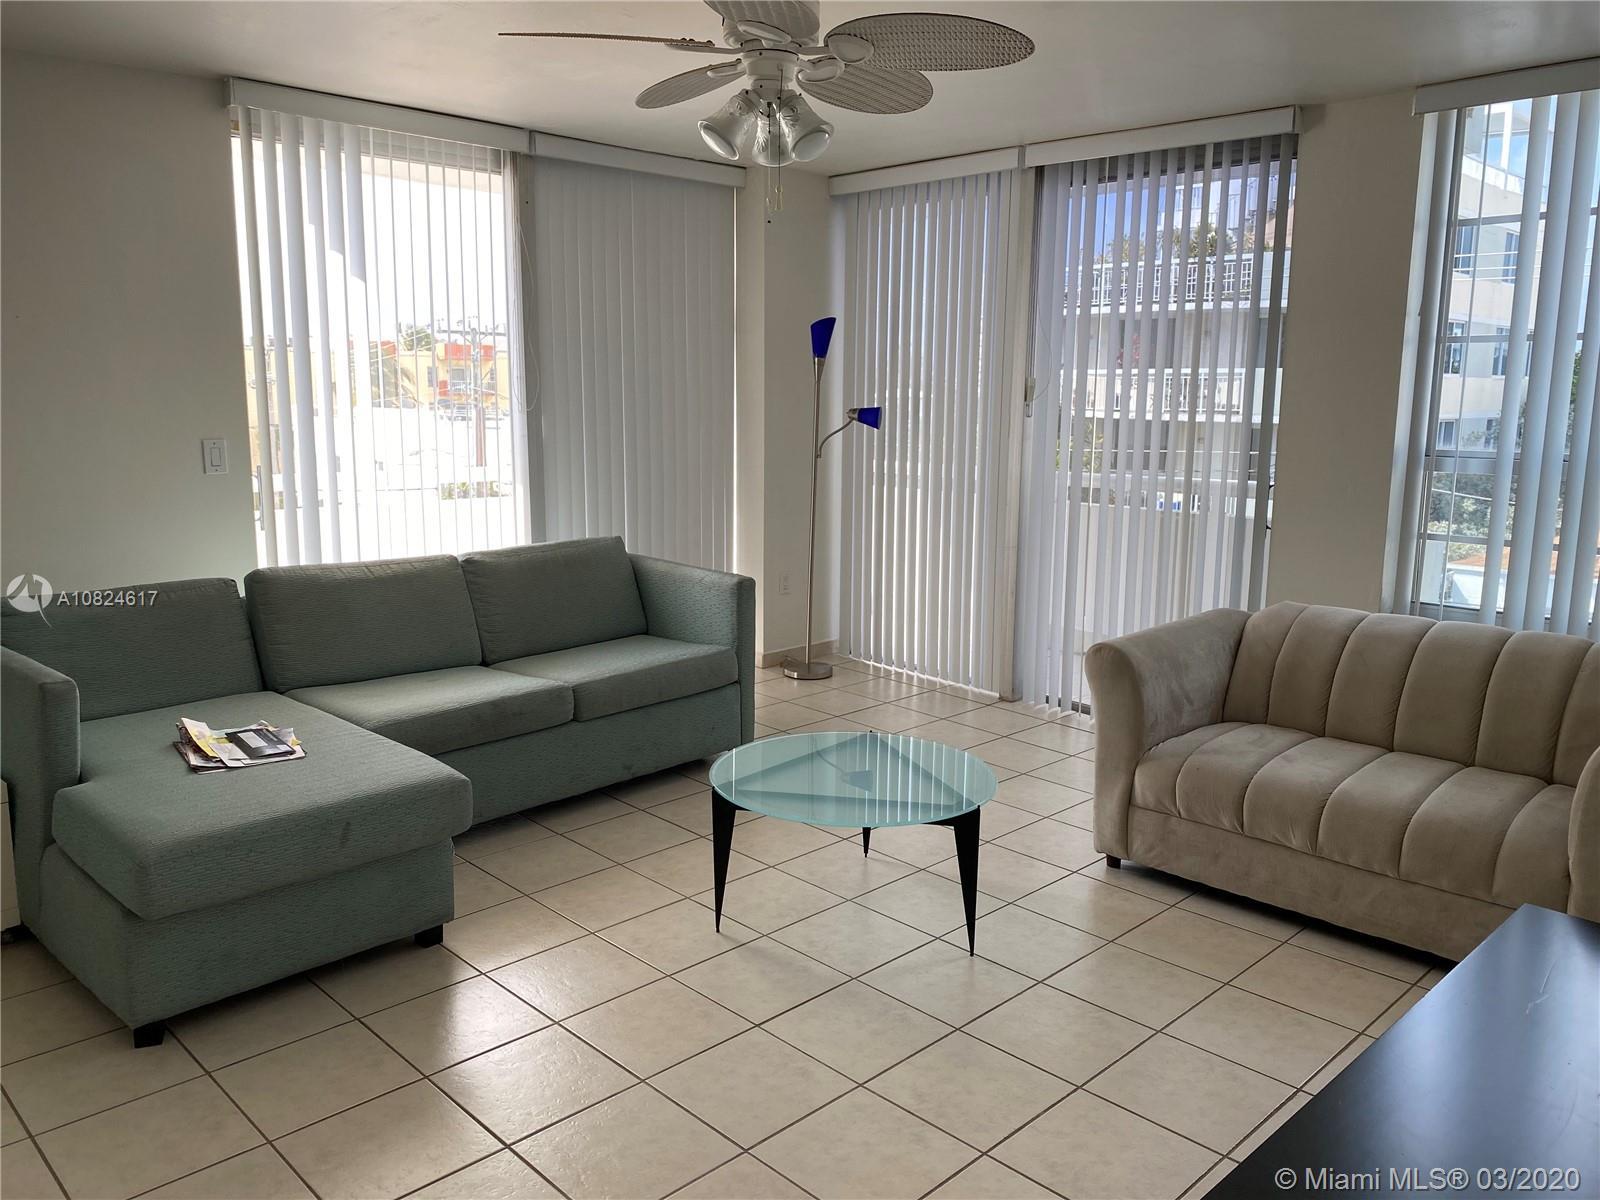 7735 Abbott Ave #4F, Miami Beach, FL 33141 - Miami Beach, FL real estate listing